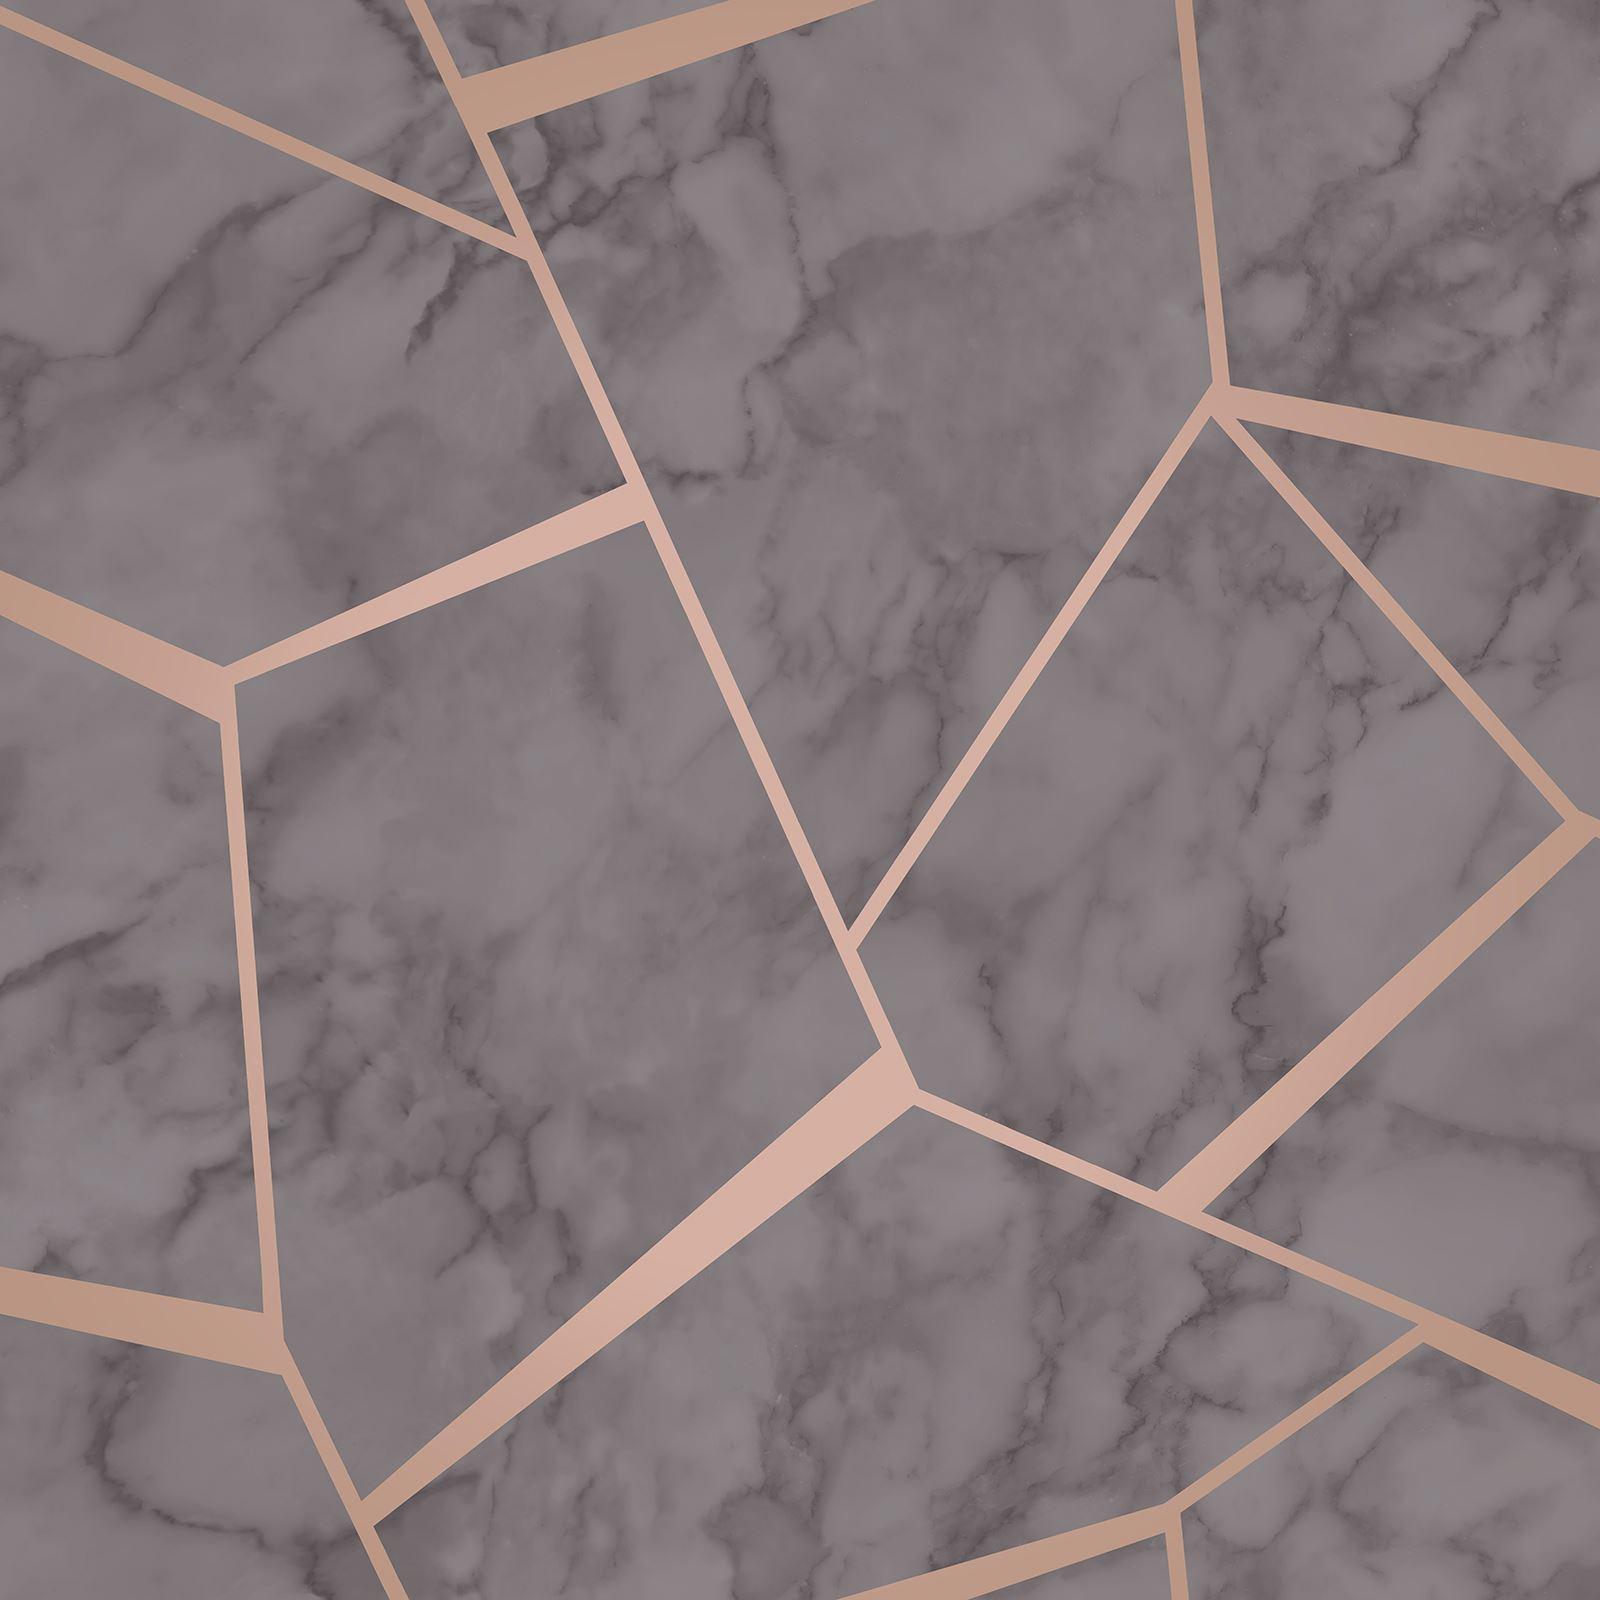 fine decor fractal geometric marble metallic wallpaper rose gold silver copper ebay. Black Bedroom Furniture Sets. Home Design Ideas